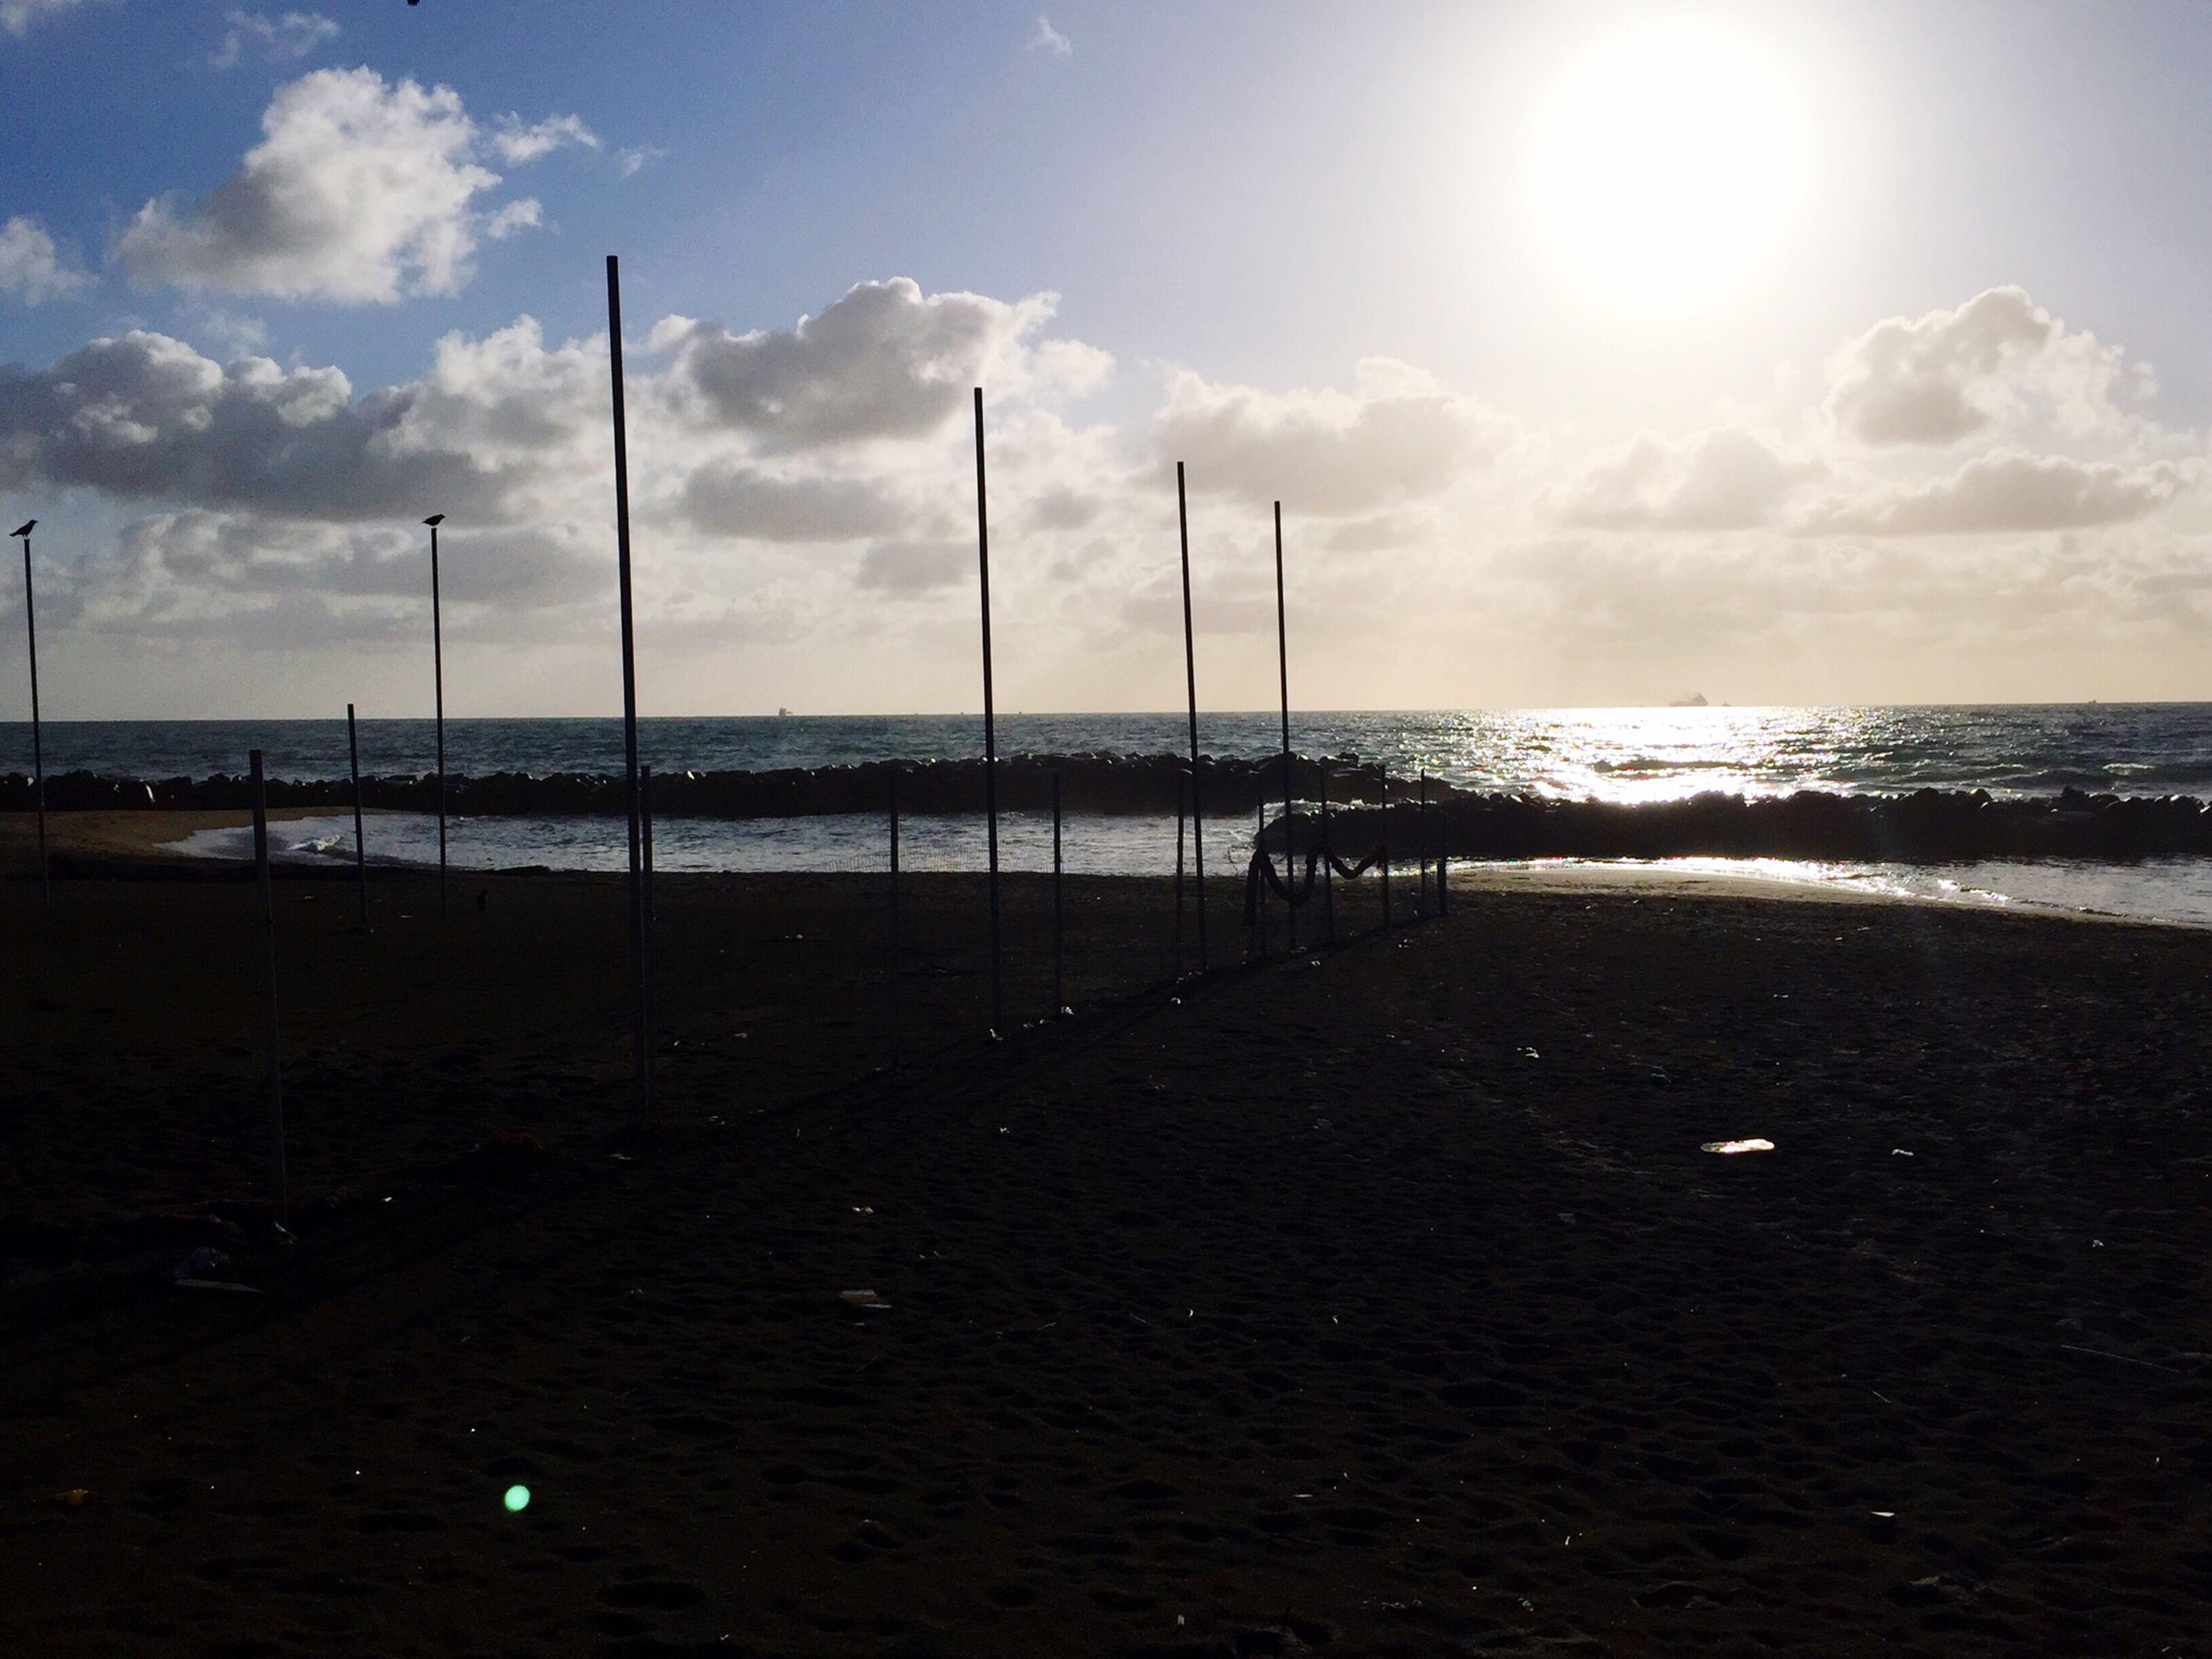 sea, horizon over water, water, beach, sky, shore, tranquil scene, tranquility, scenics, beauty in nature, nature, sand, sunlight, cloud - sky, idyllic, sun, pier, cloud, incidental people, sunbeam